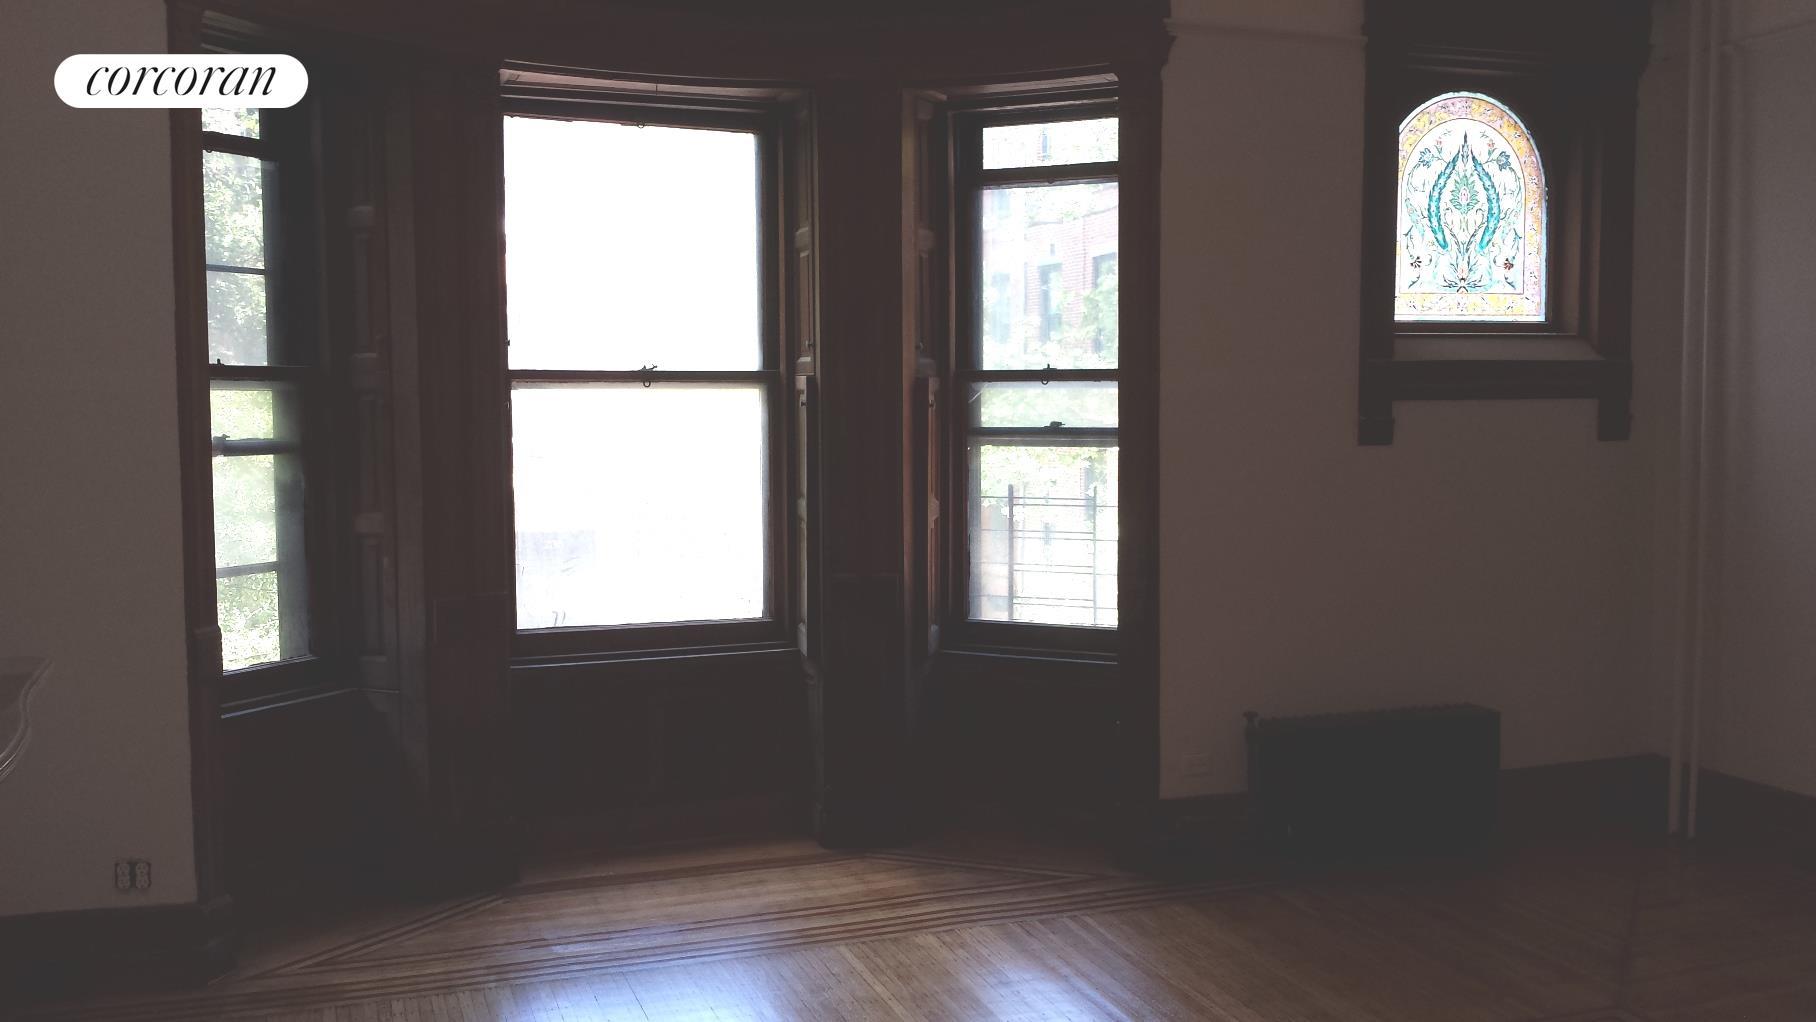 Corcoran 240 Berkeley Place Apt 3 Park Slope Rentals